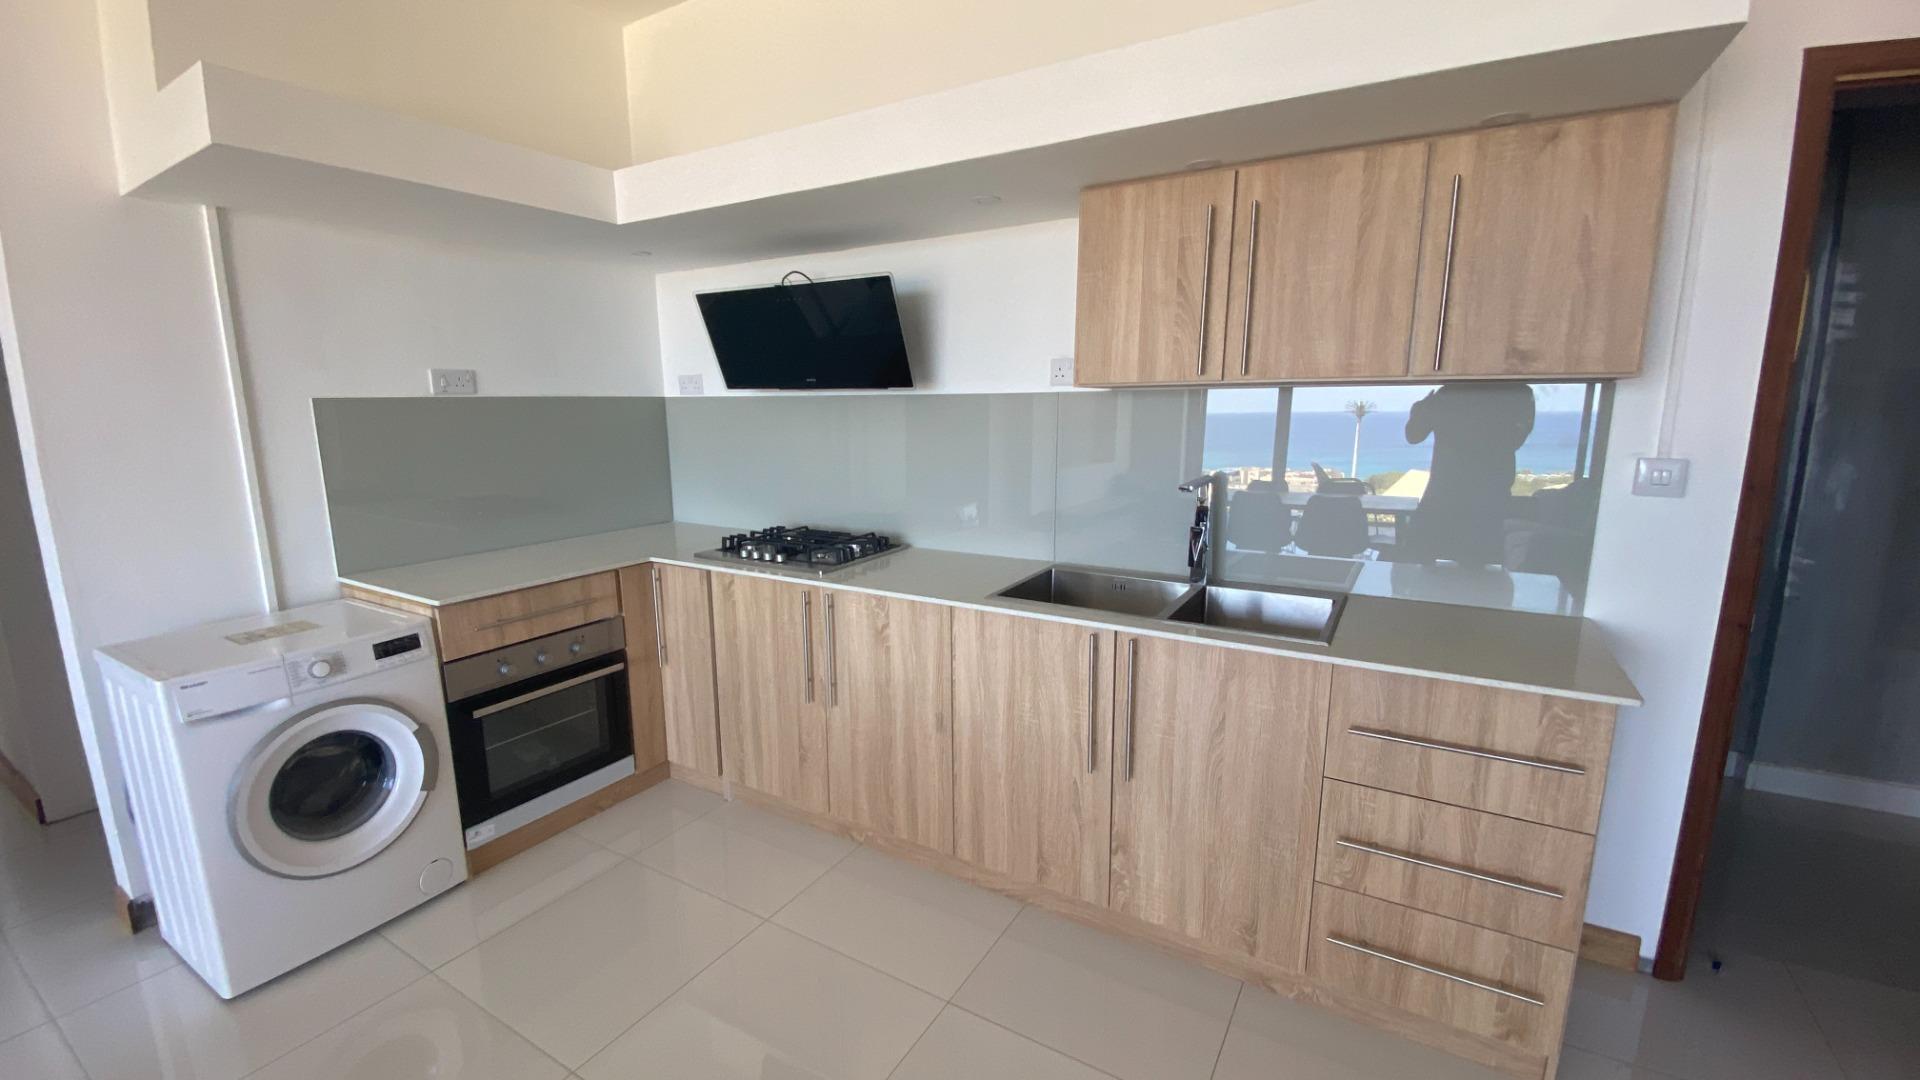 3 Bedroom Apartment / Flat For Sale in Flic En Flac